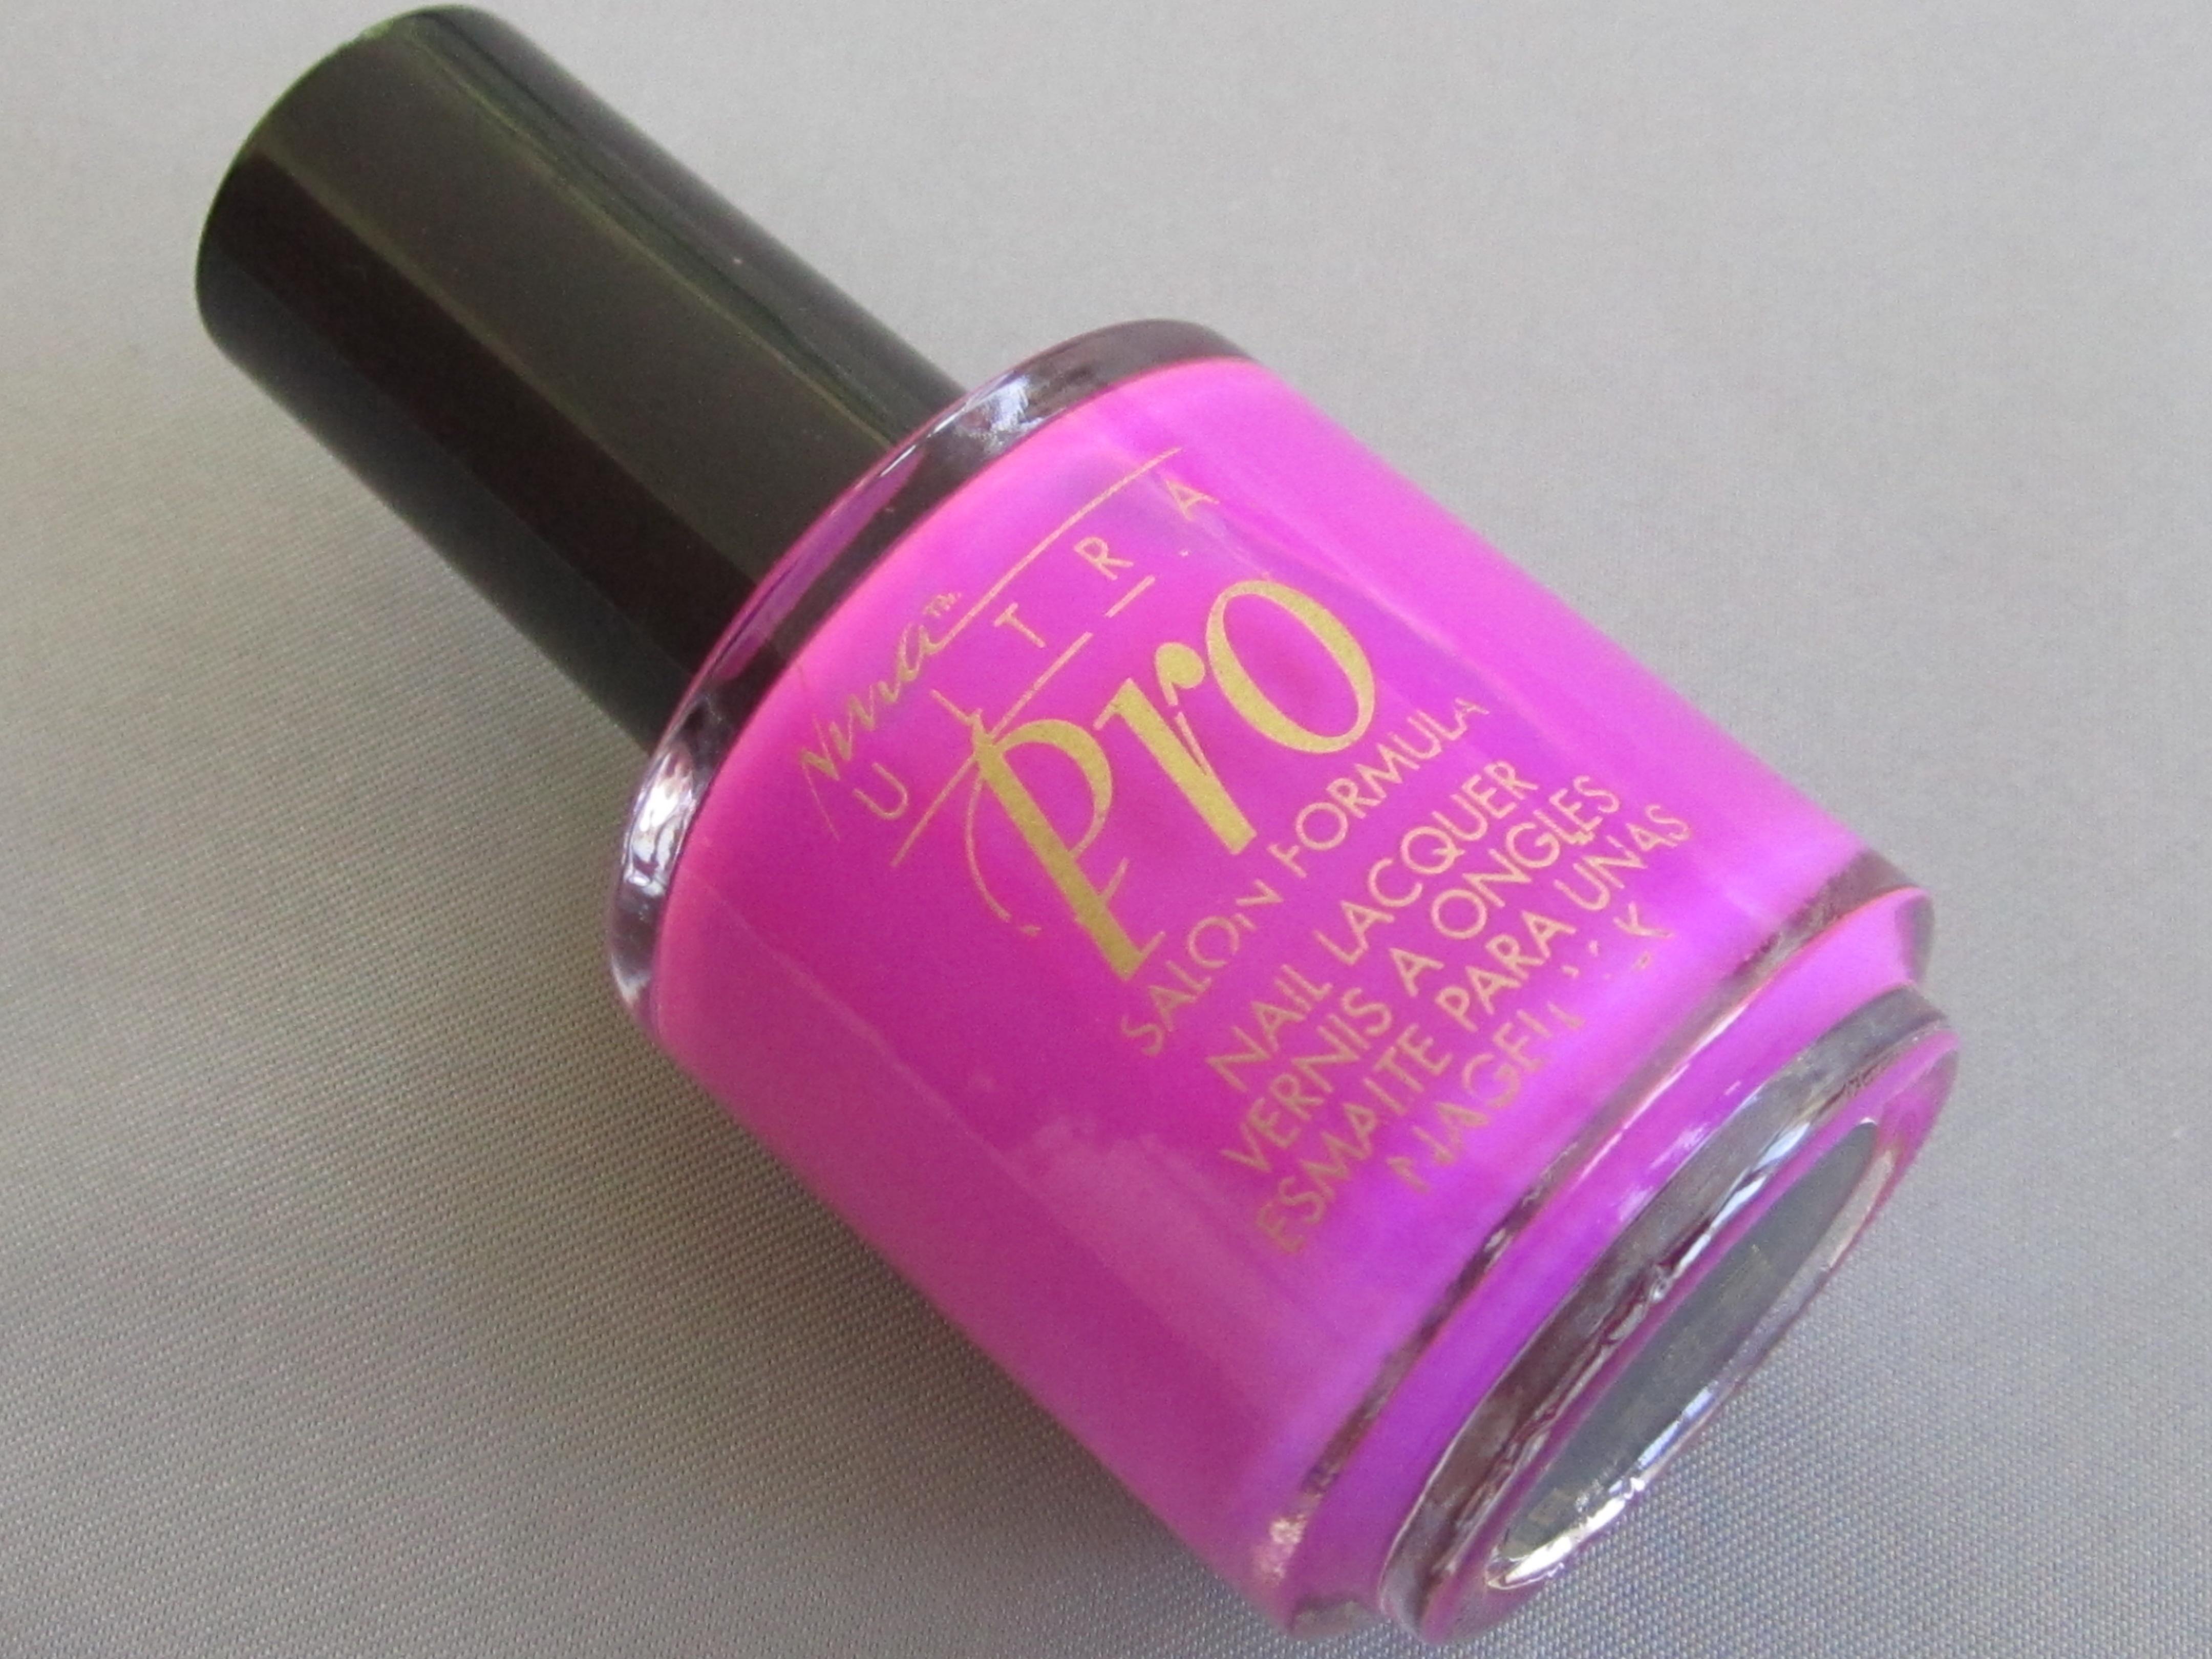 NOTD: Nina Ultra Pro Passion Pink